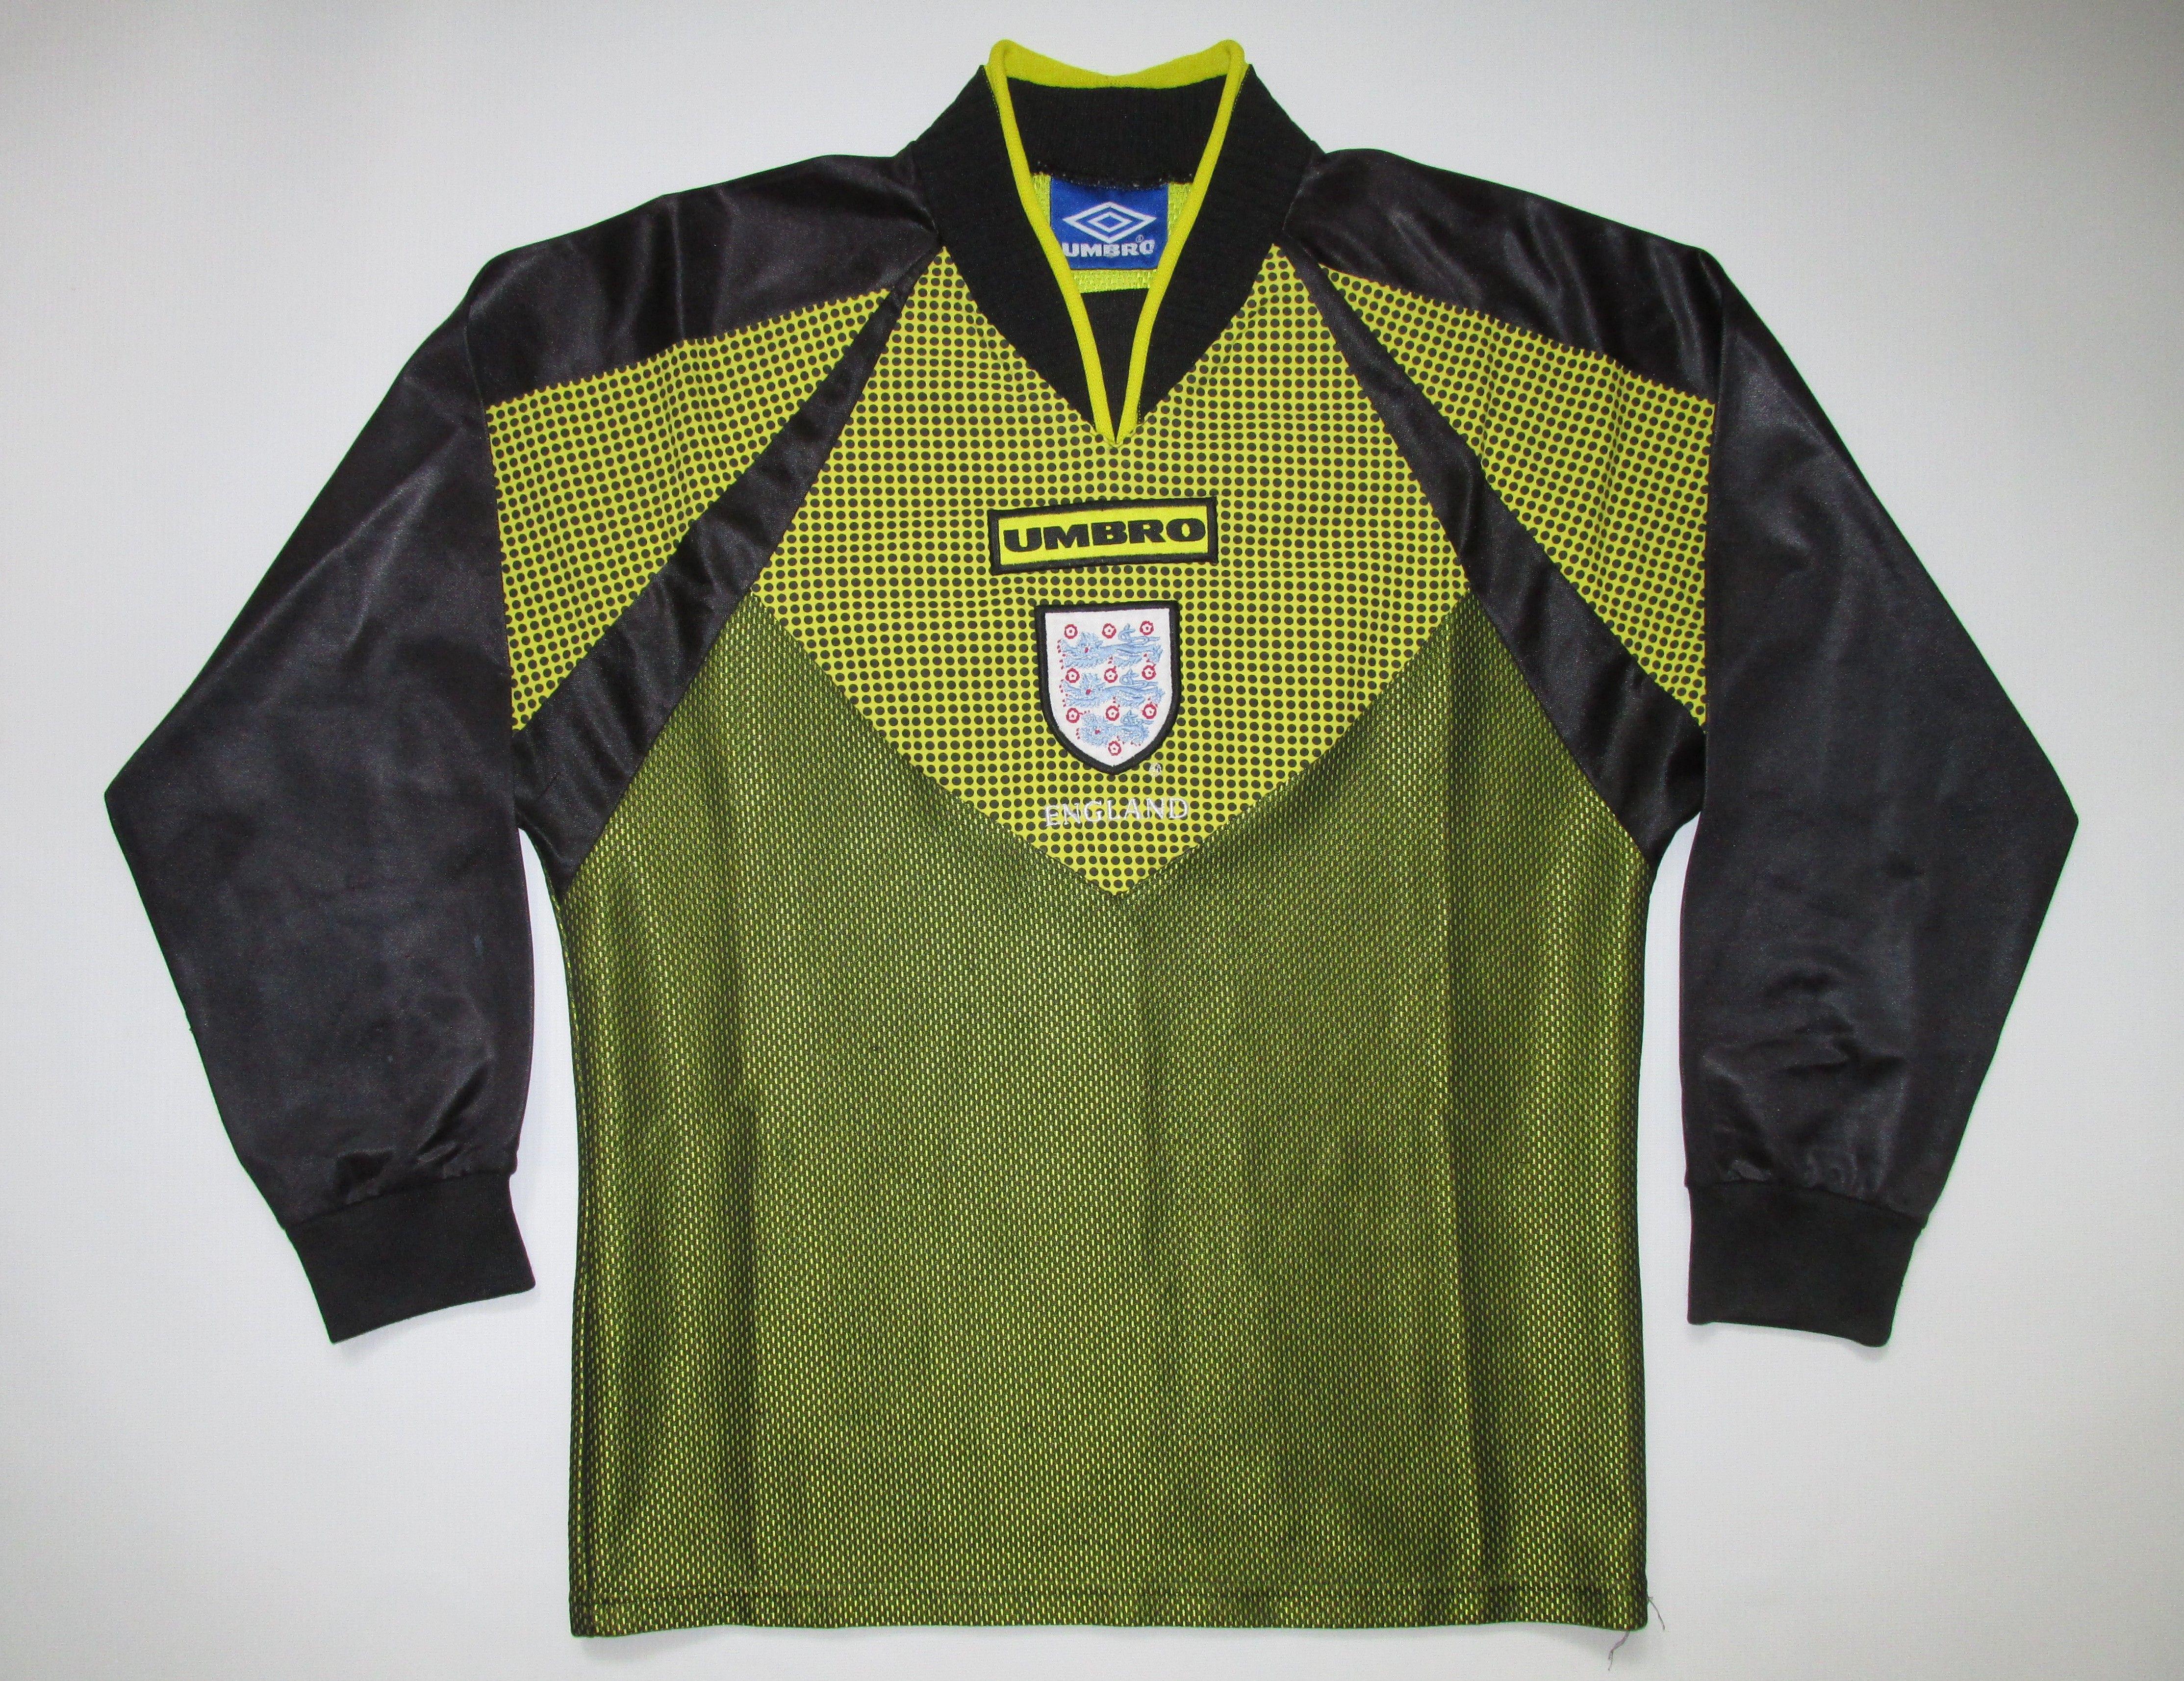 England 1998 1999 Goalkeeper Football Shirt By Umbro Vintage Soccer Worldcup Retro 90s Jersey Threelions England Goalkeeper Shirts Football Shirts Goalkeeper